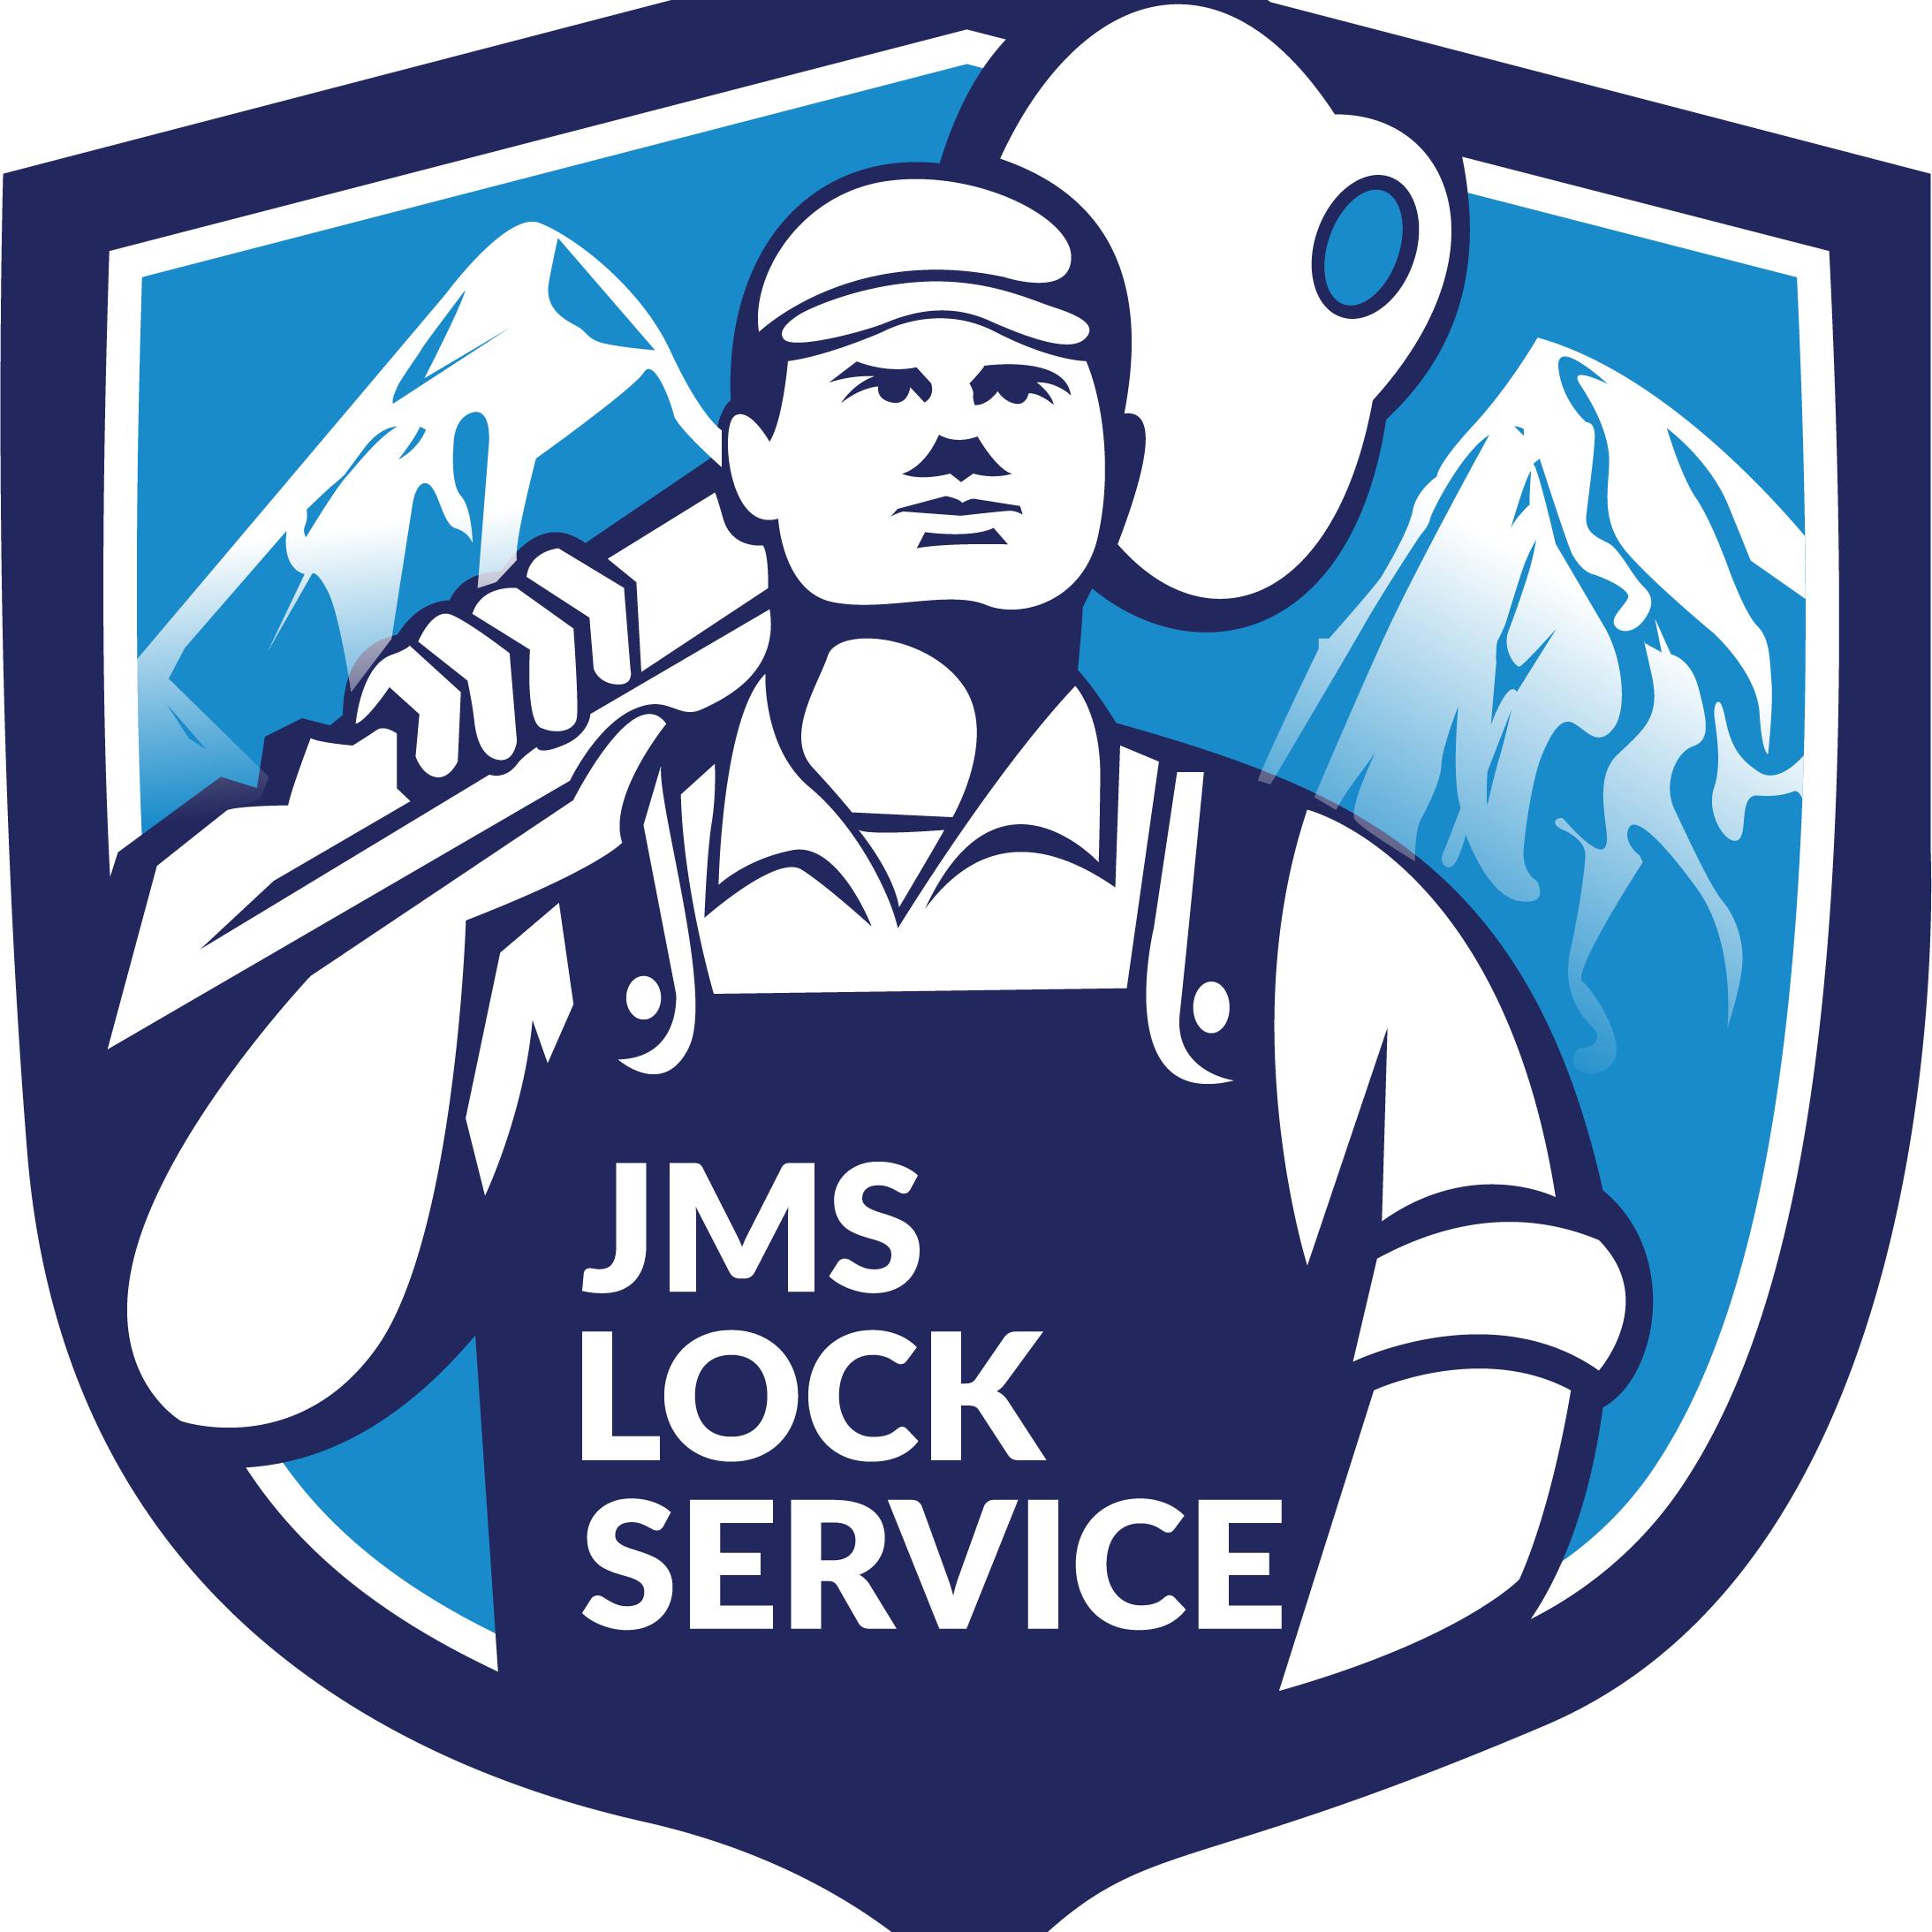 JMS Lock Service | Locksmith Flagstaff AZ